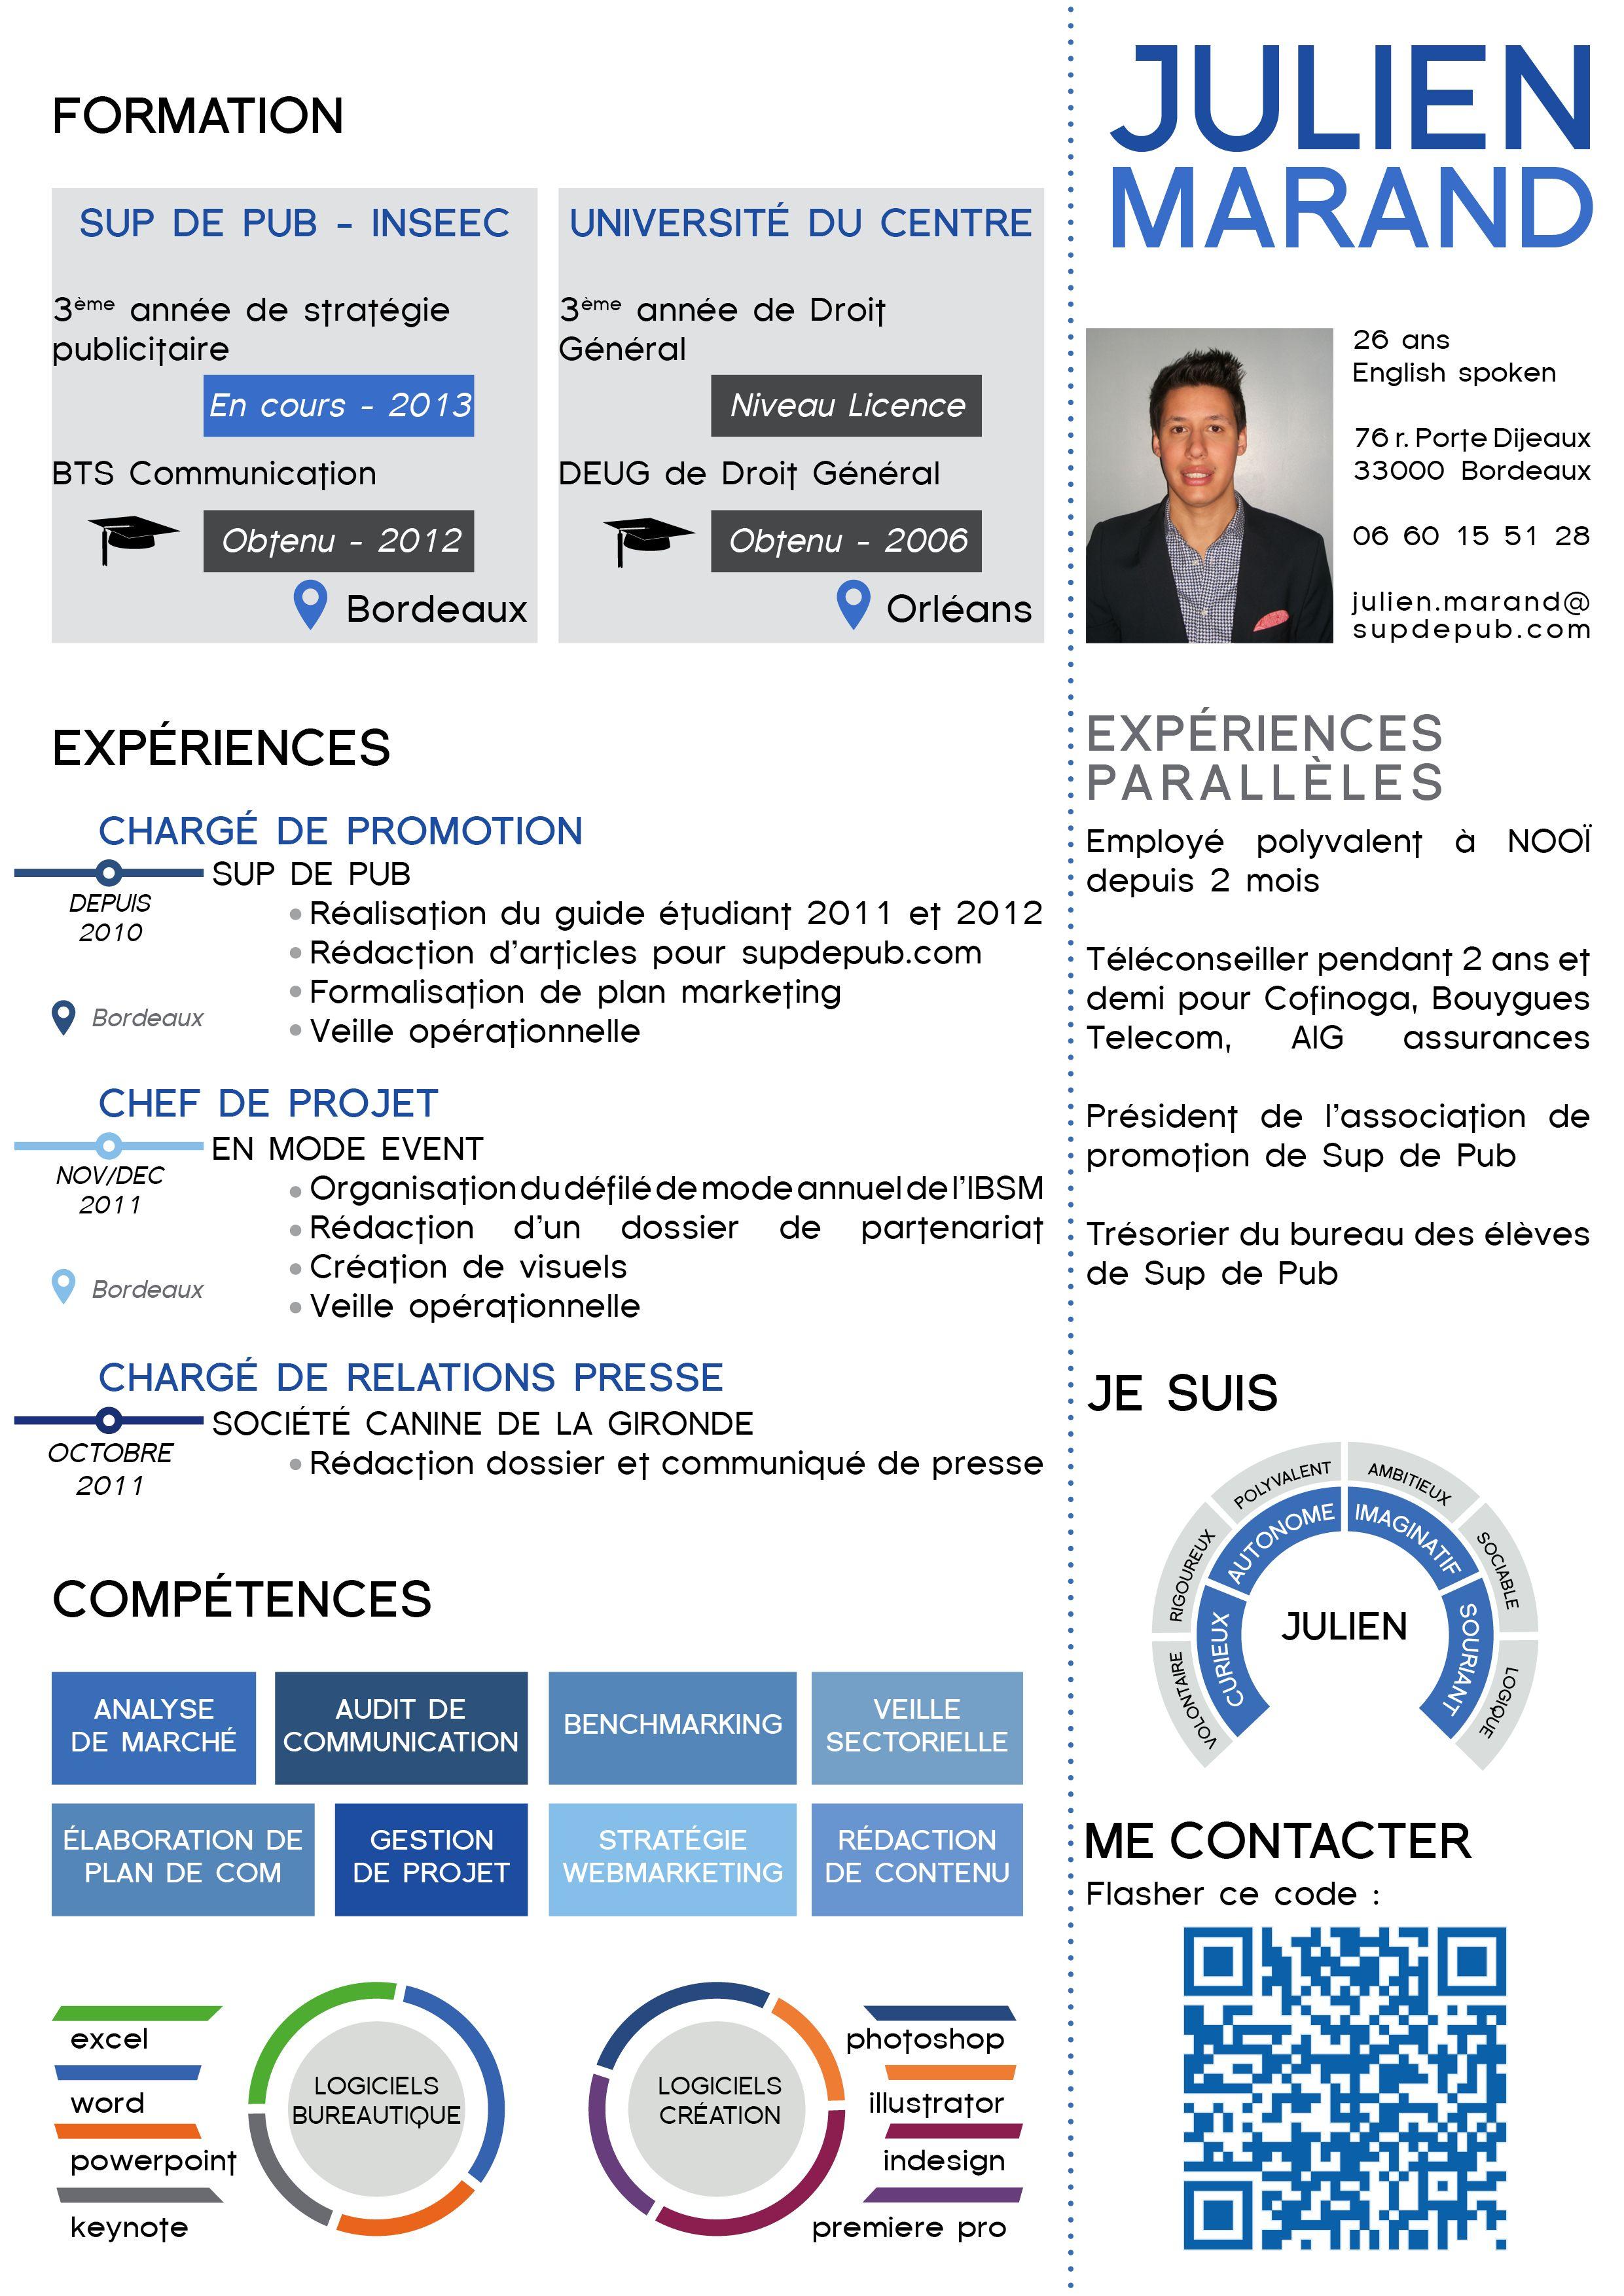 marketing manager cv example, marketing manager cv example